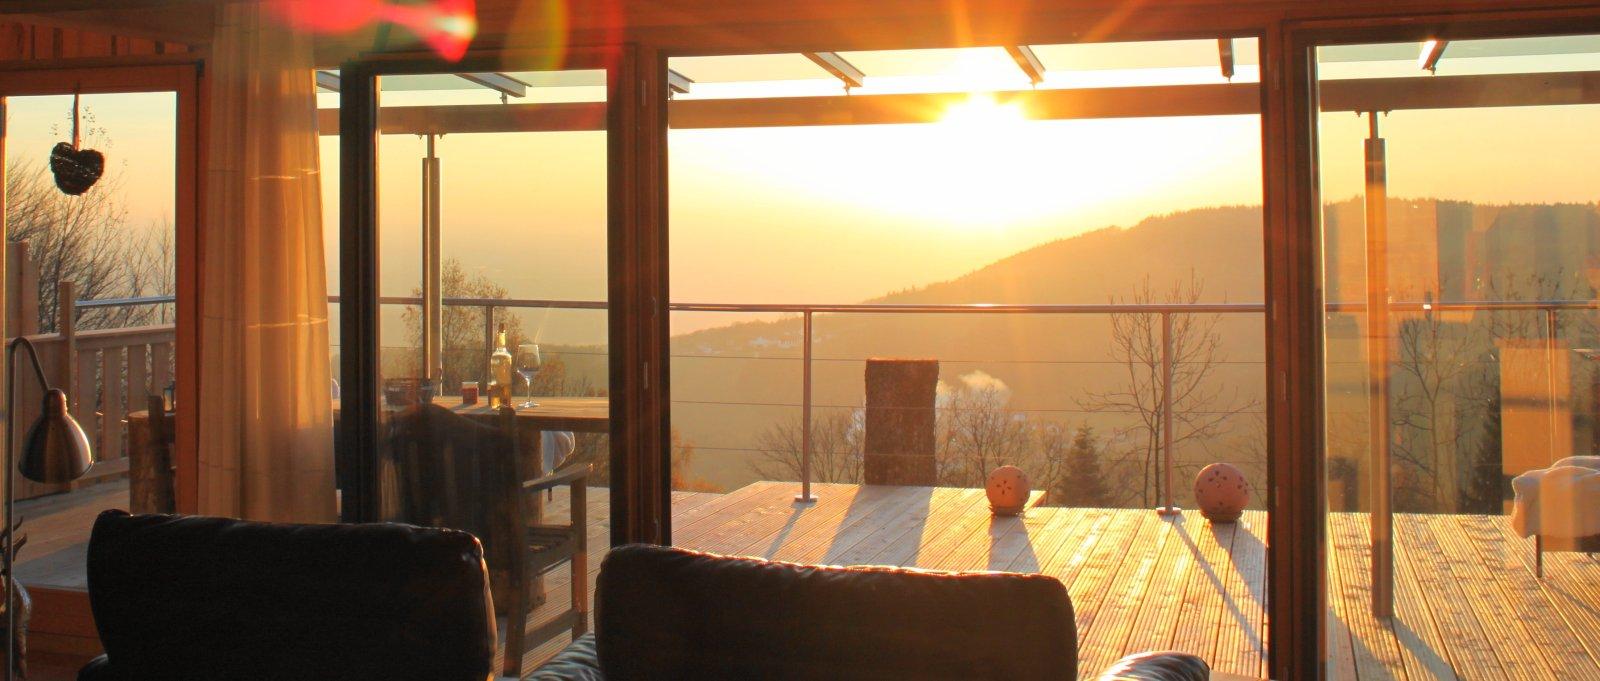 zweisamkeit-berghütten-bayern-romantikurlaub-2-personen-panorama-1600